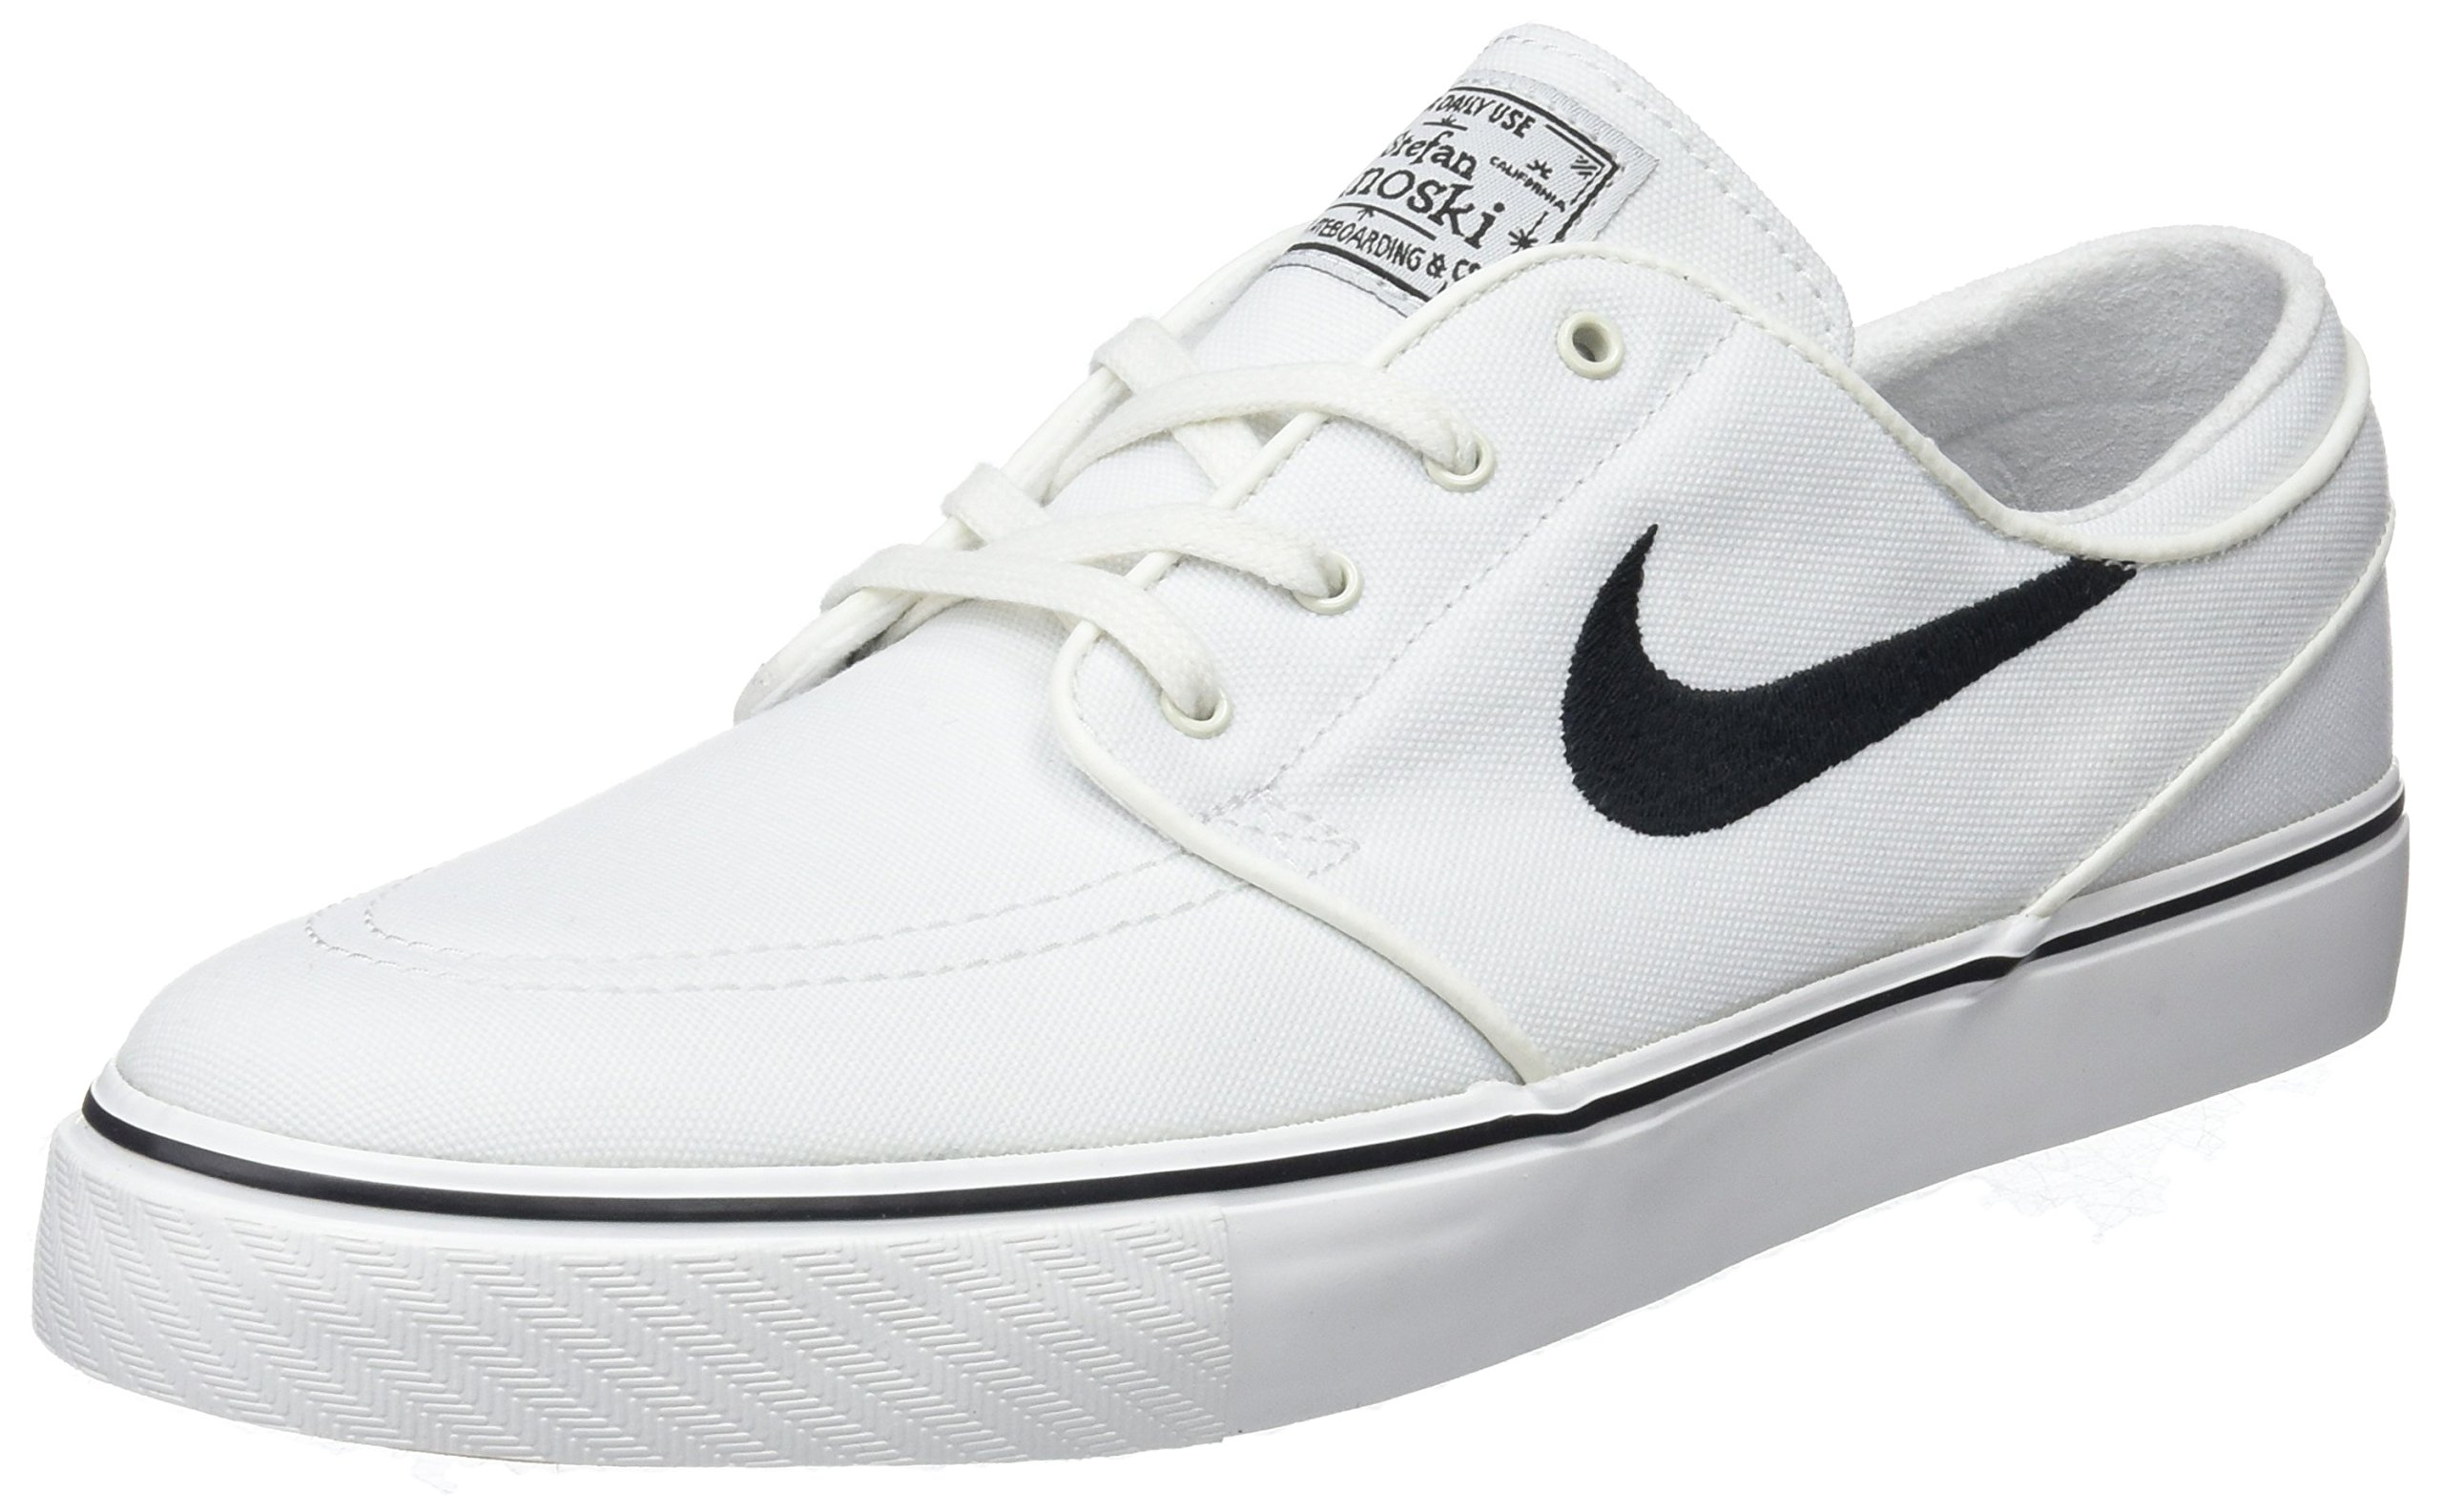 Nike Men's Zoom Stefan Janoski Cnvs Summit White/Black Skate Shoe 11